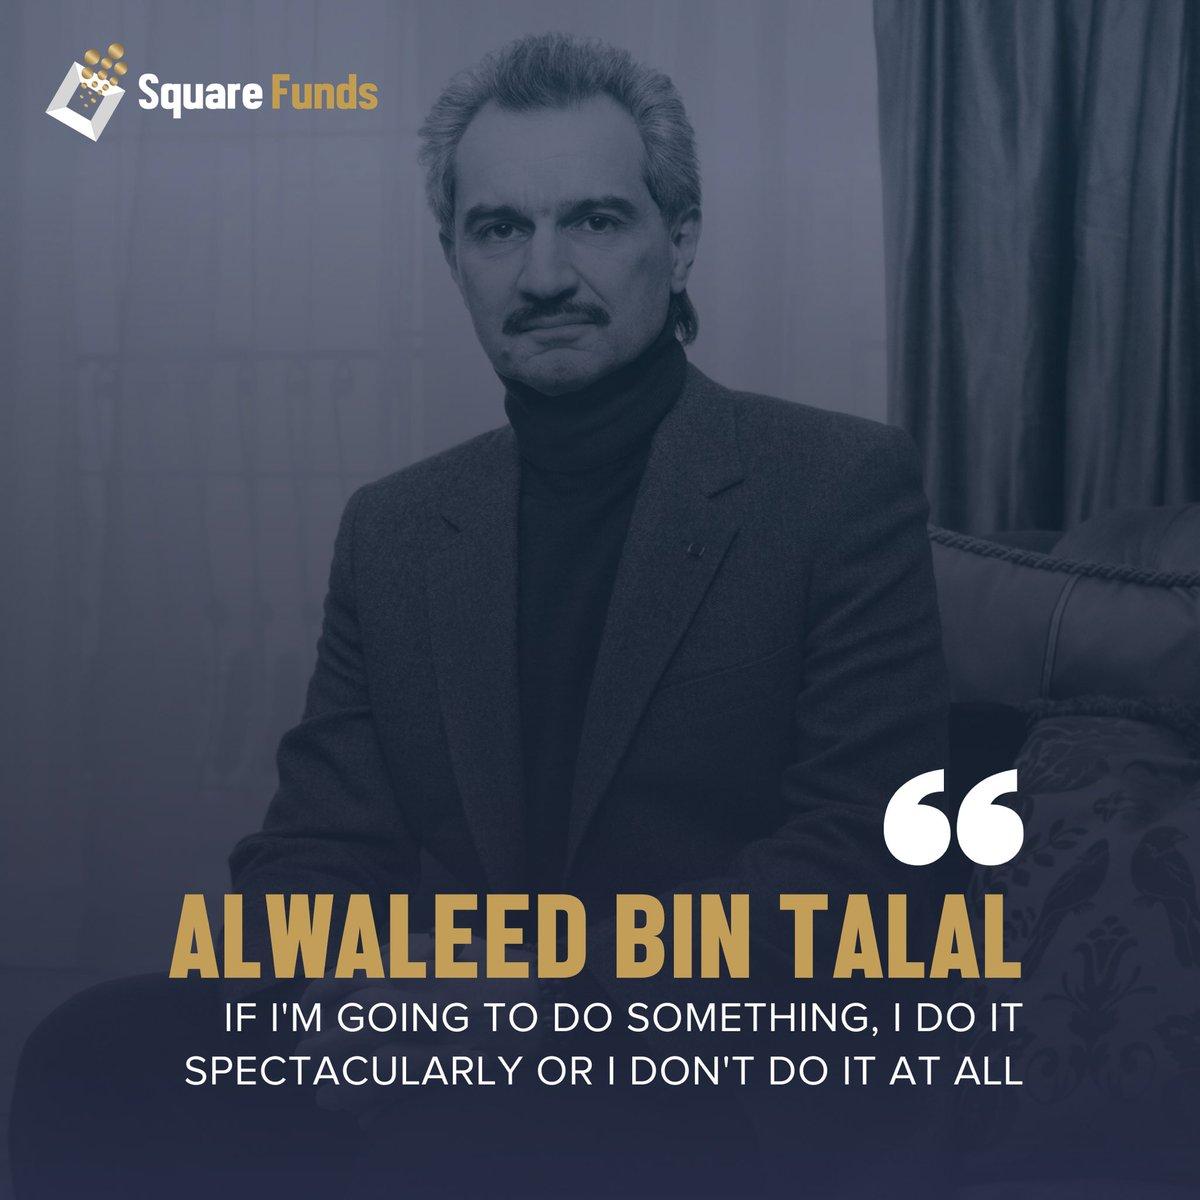 A fantastic quote by an inspiring figure. #SquareFunds #Bahrain #SaudiArabia #AlwaleedBinTalal https://t.co/HWtMUQlJYt